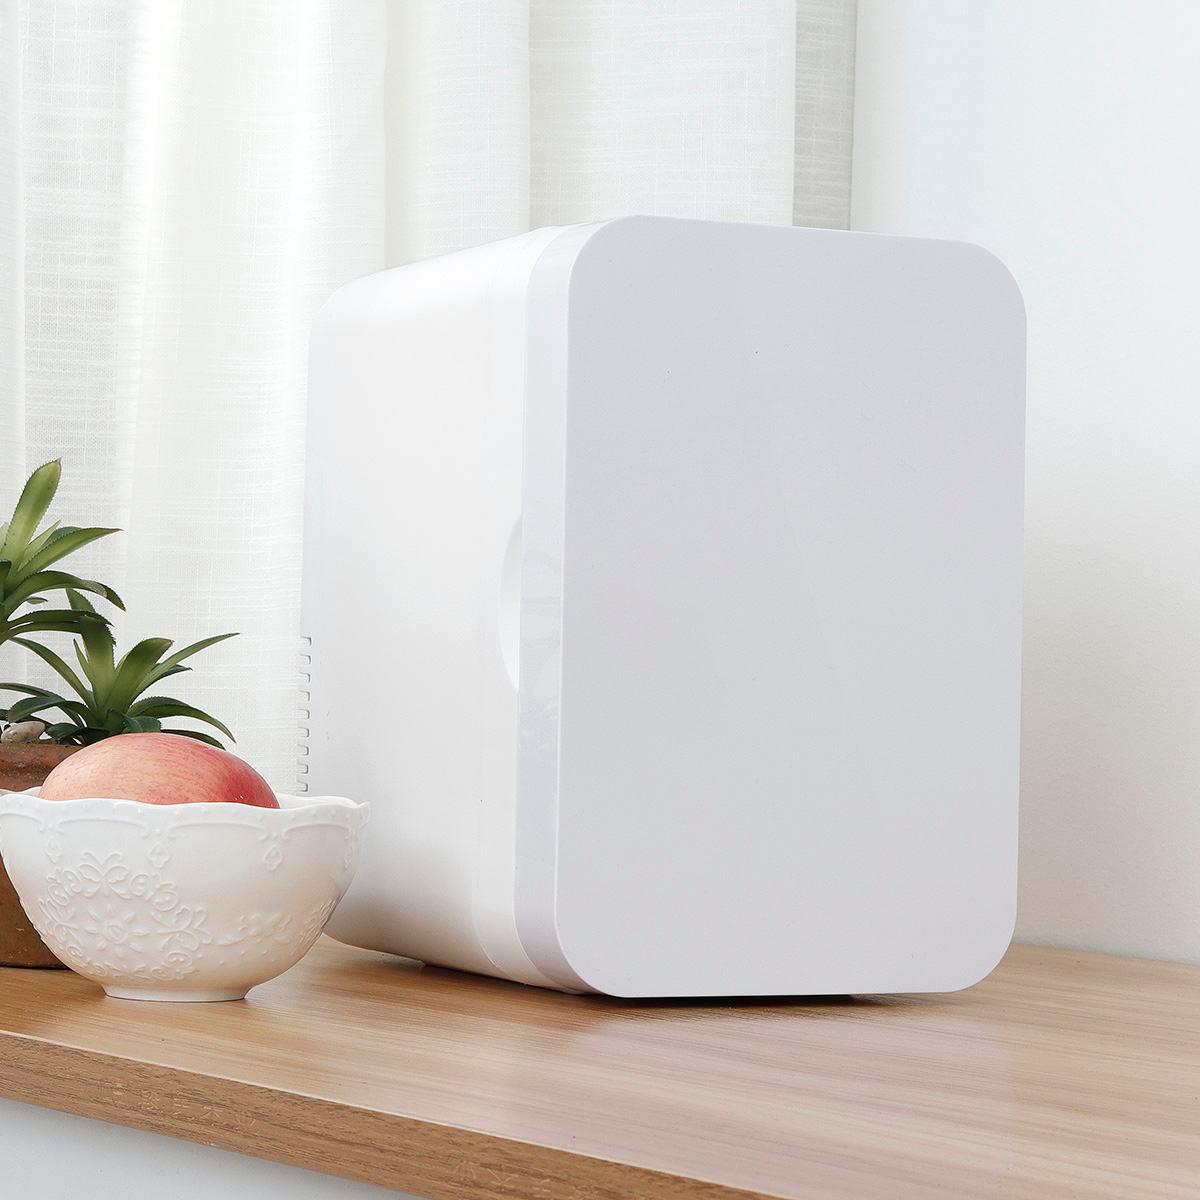 6L 24V 12V Mini Refrigerator Small Household Use Dormitory Single Door Home Dual-use Refrigerator